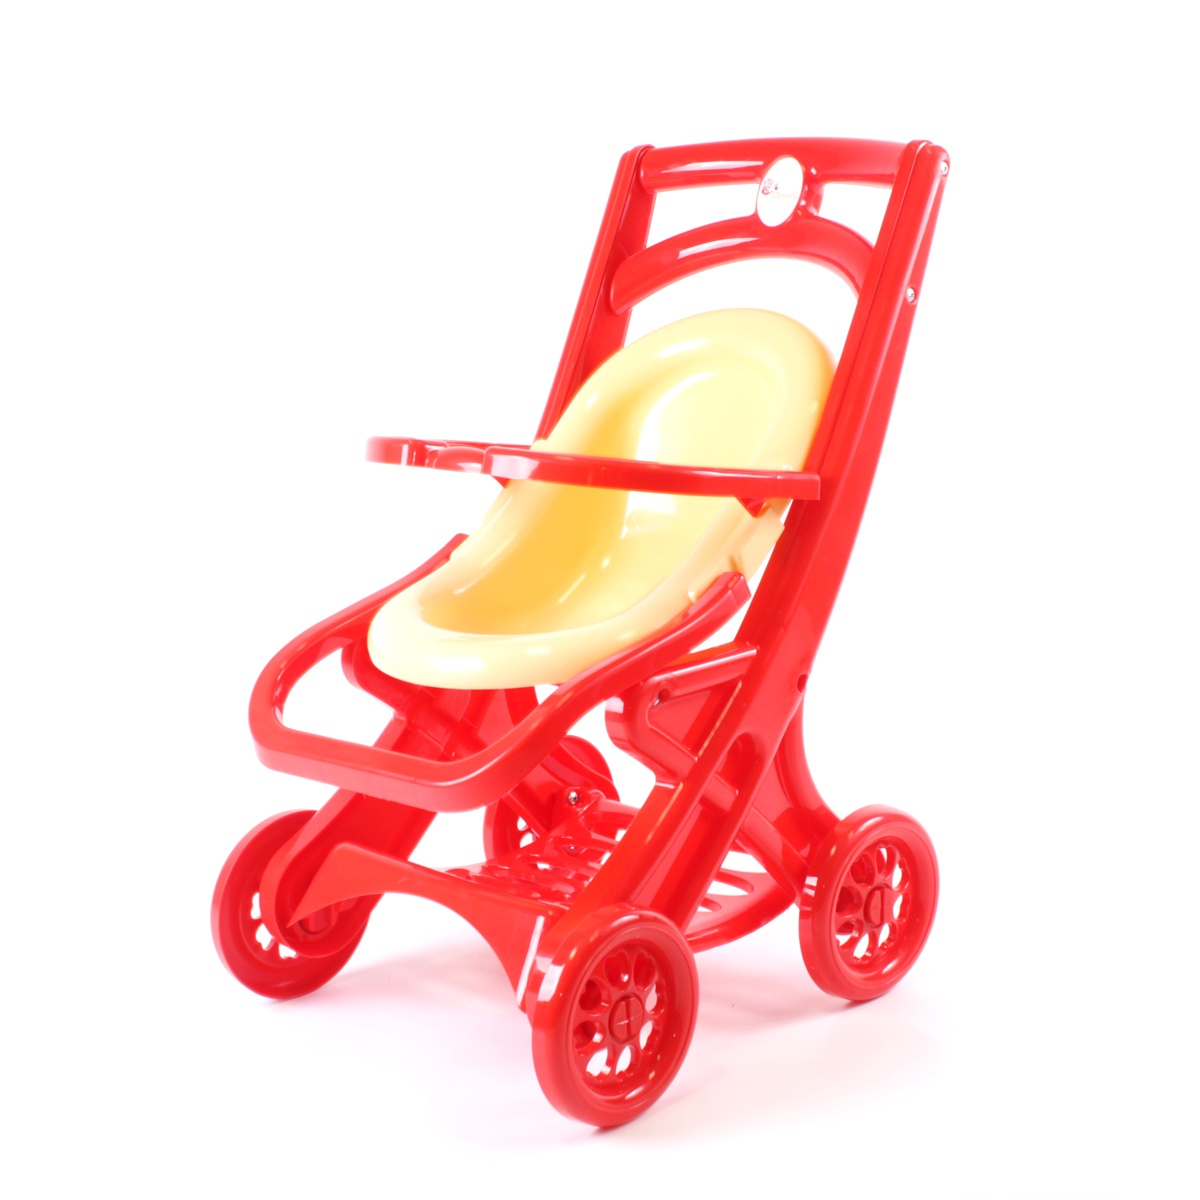 коляска для кукол Doloni Коляска кукол, 0122/03 красный, бежевый